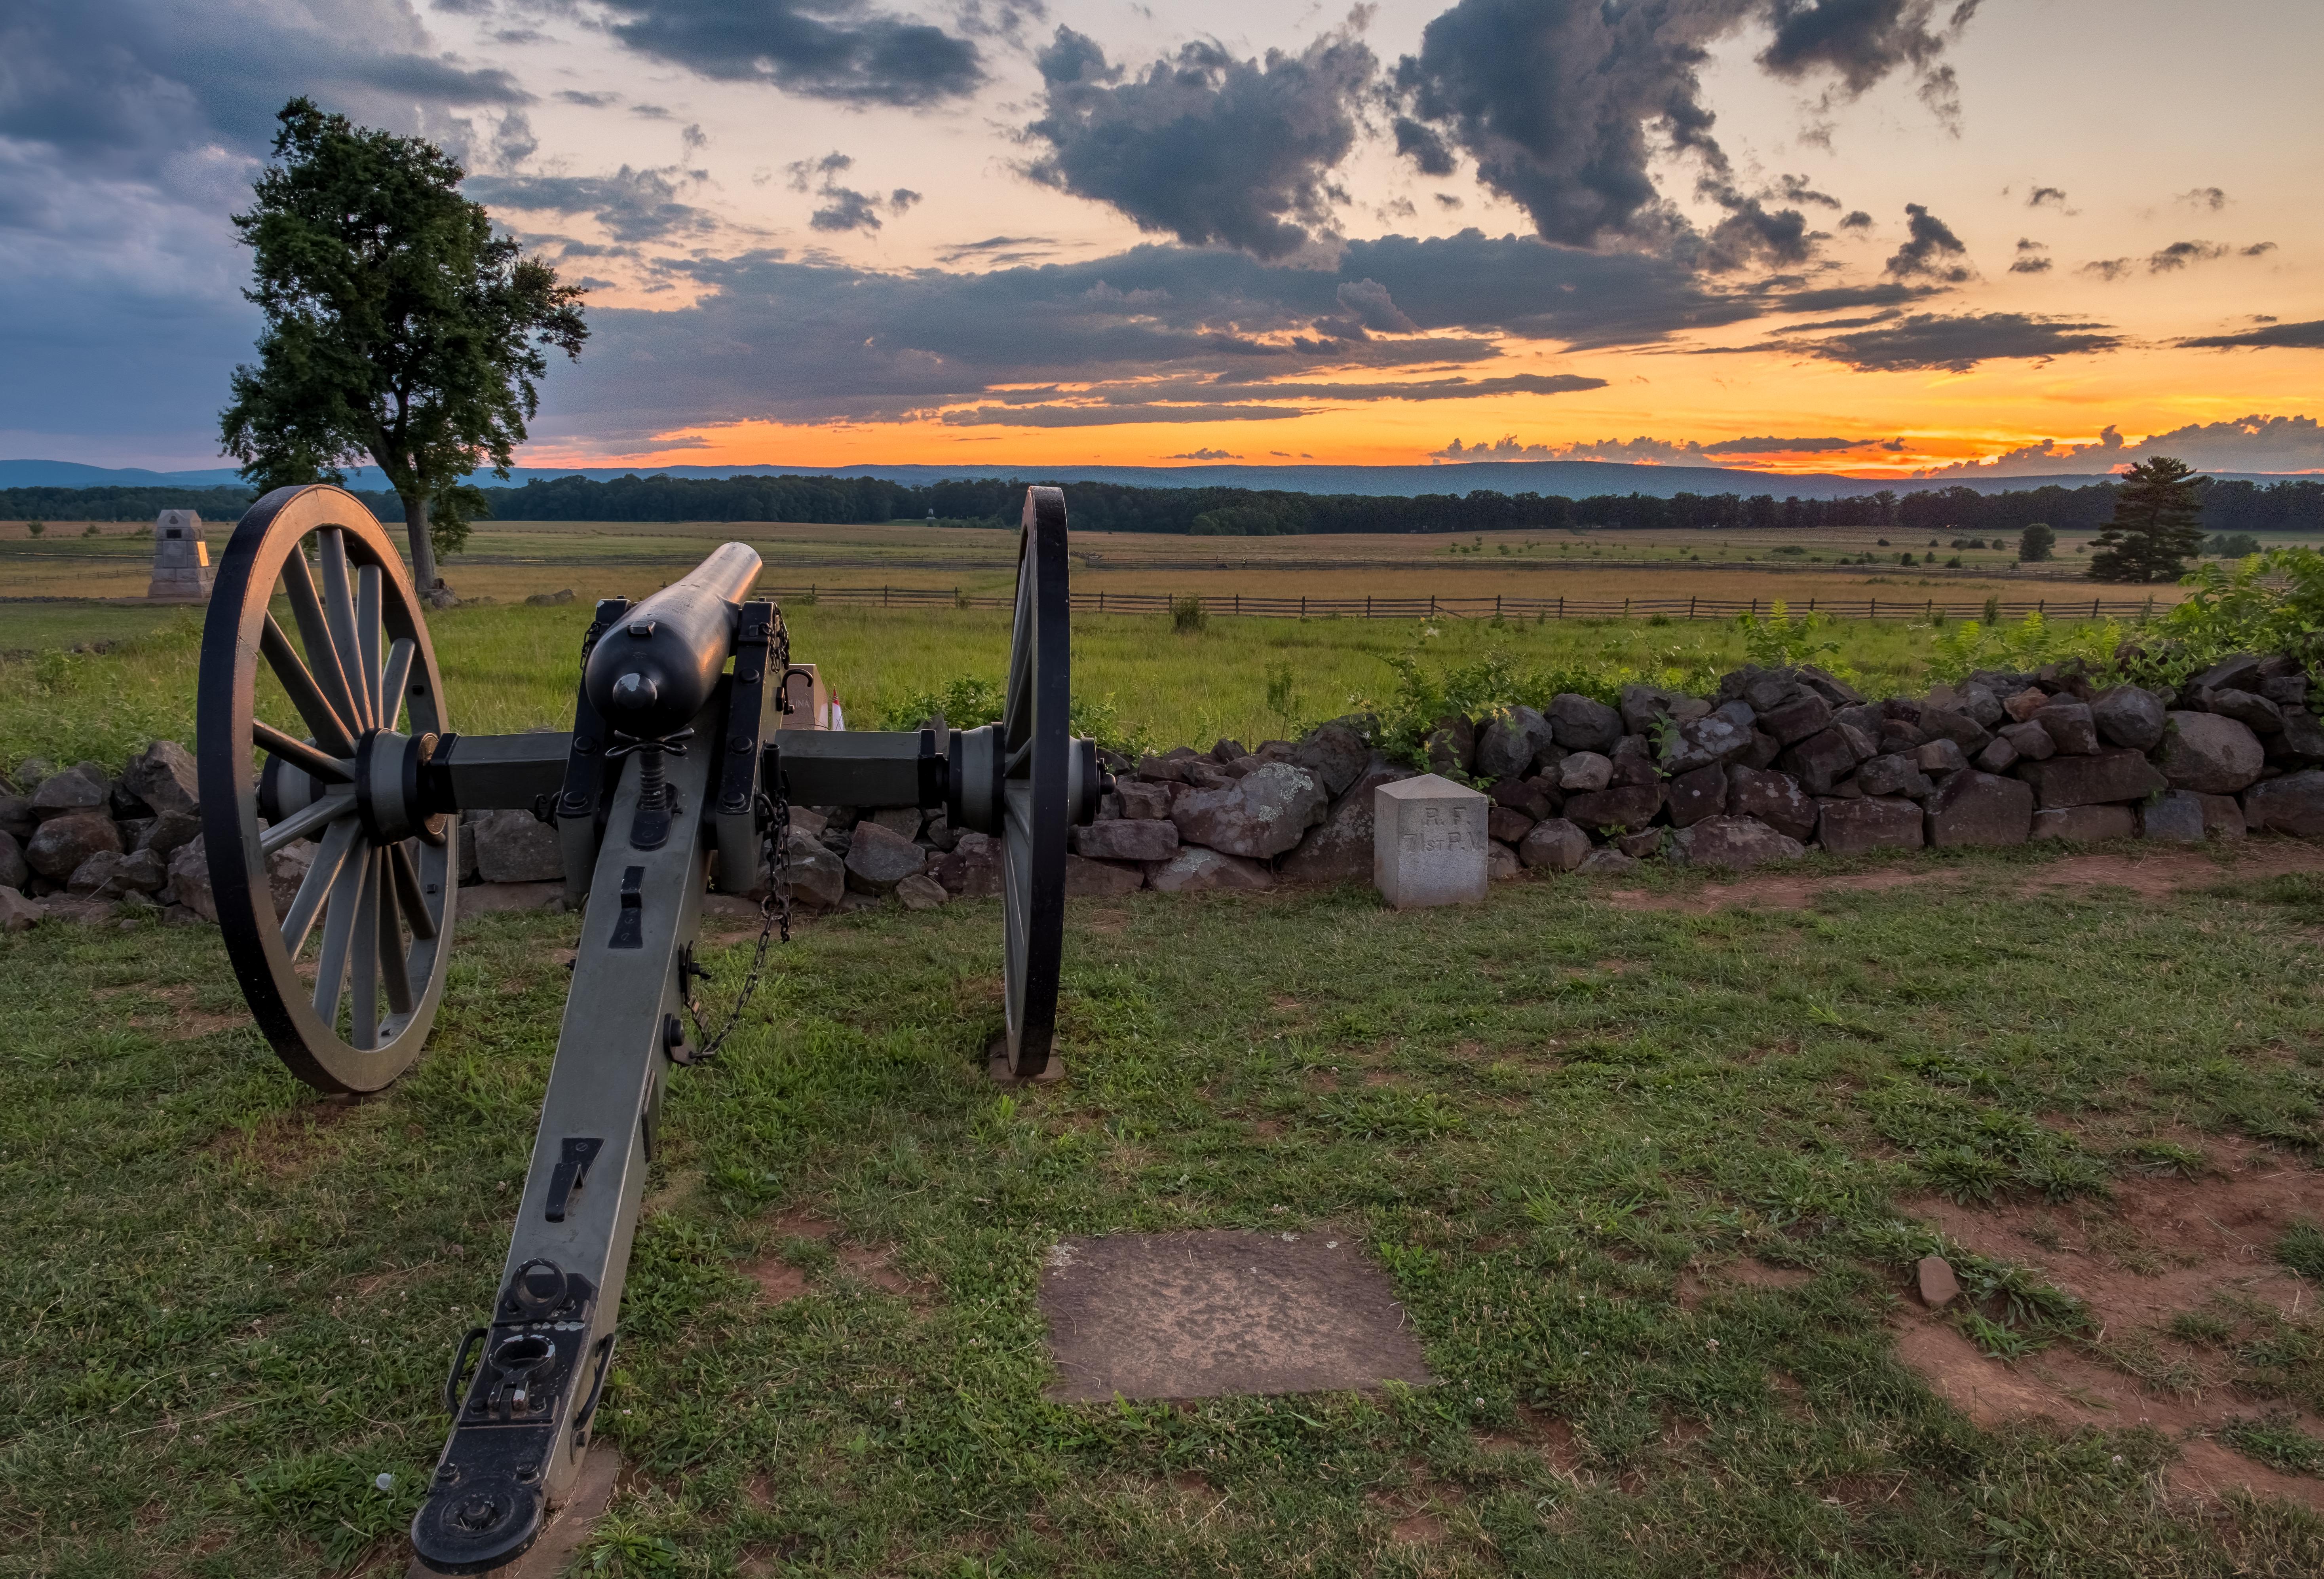 Sunset at Gettysburg National Military Park - Historic Battlefields